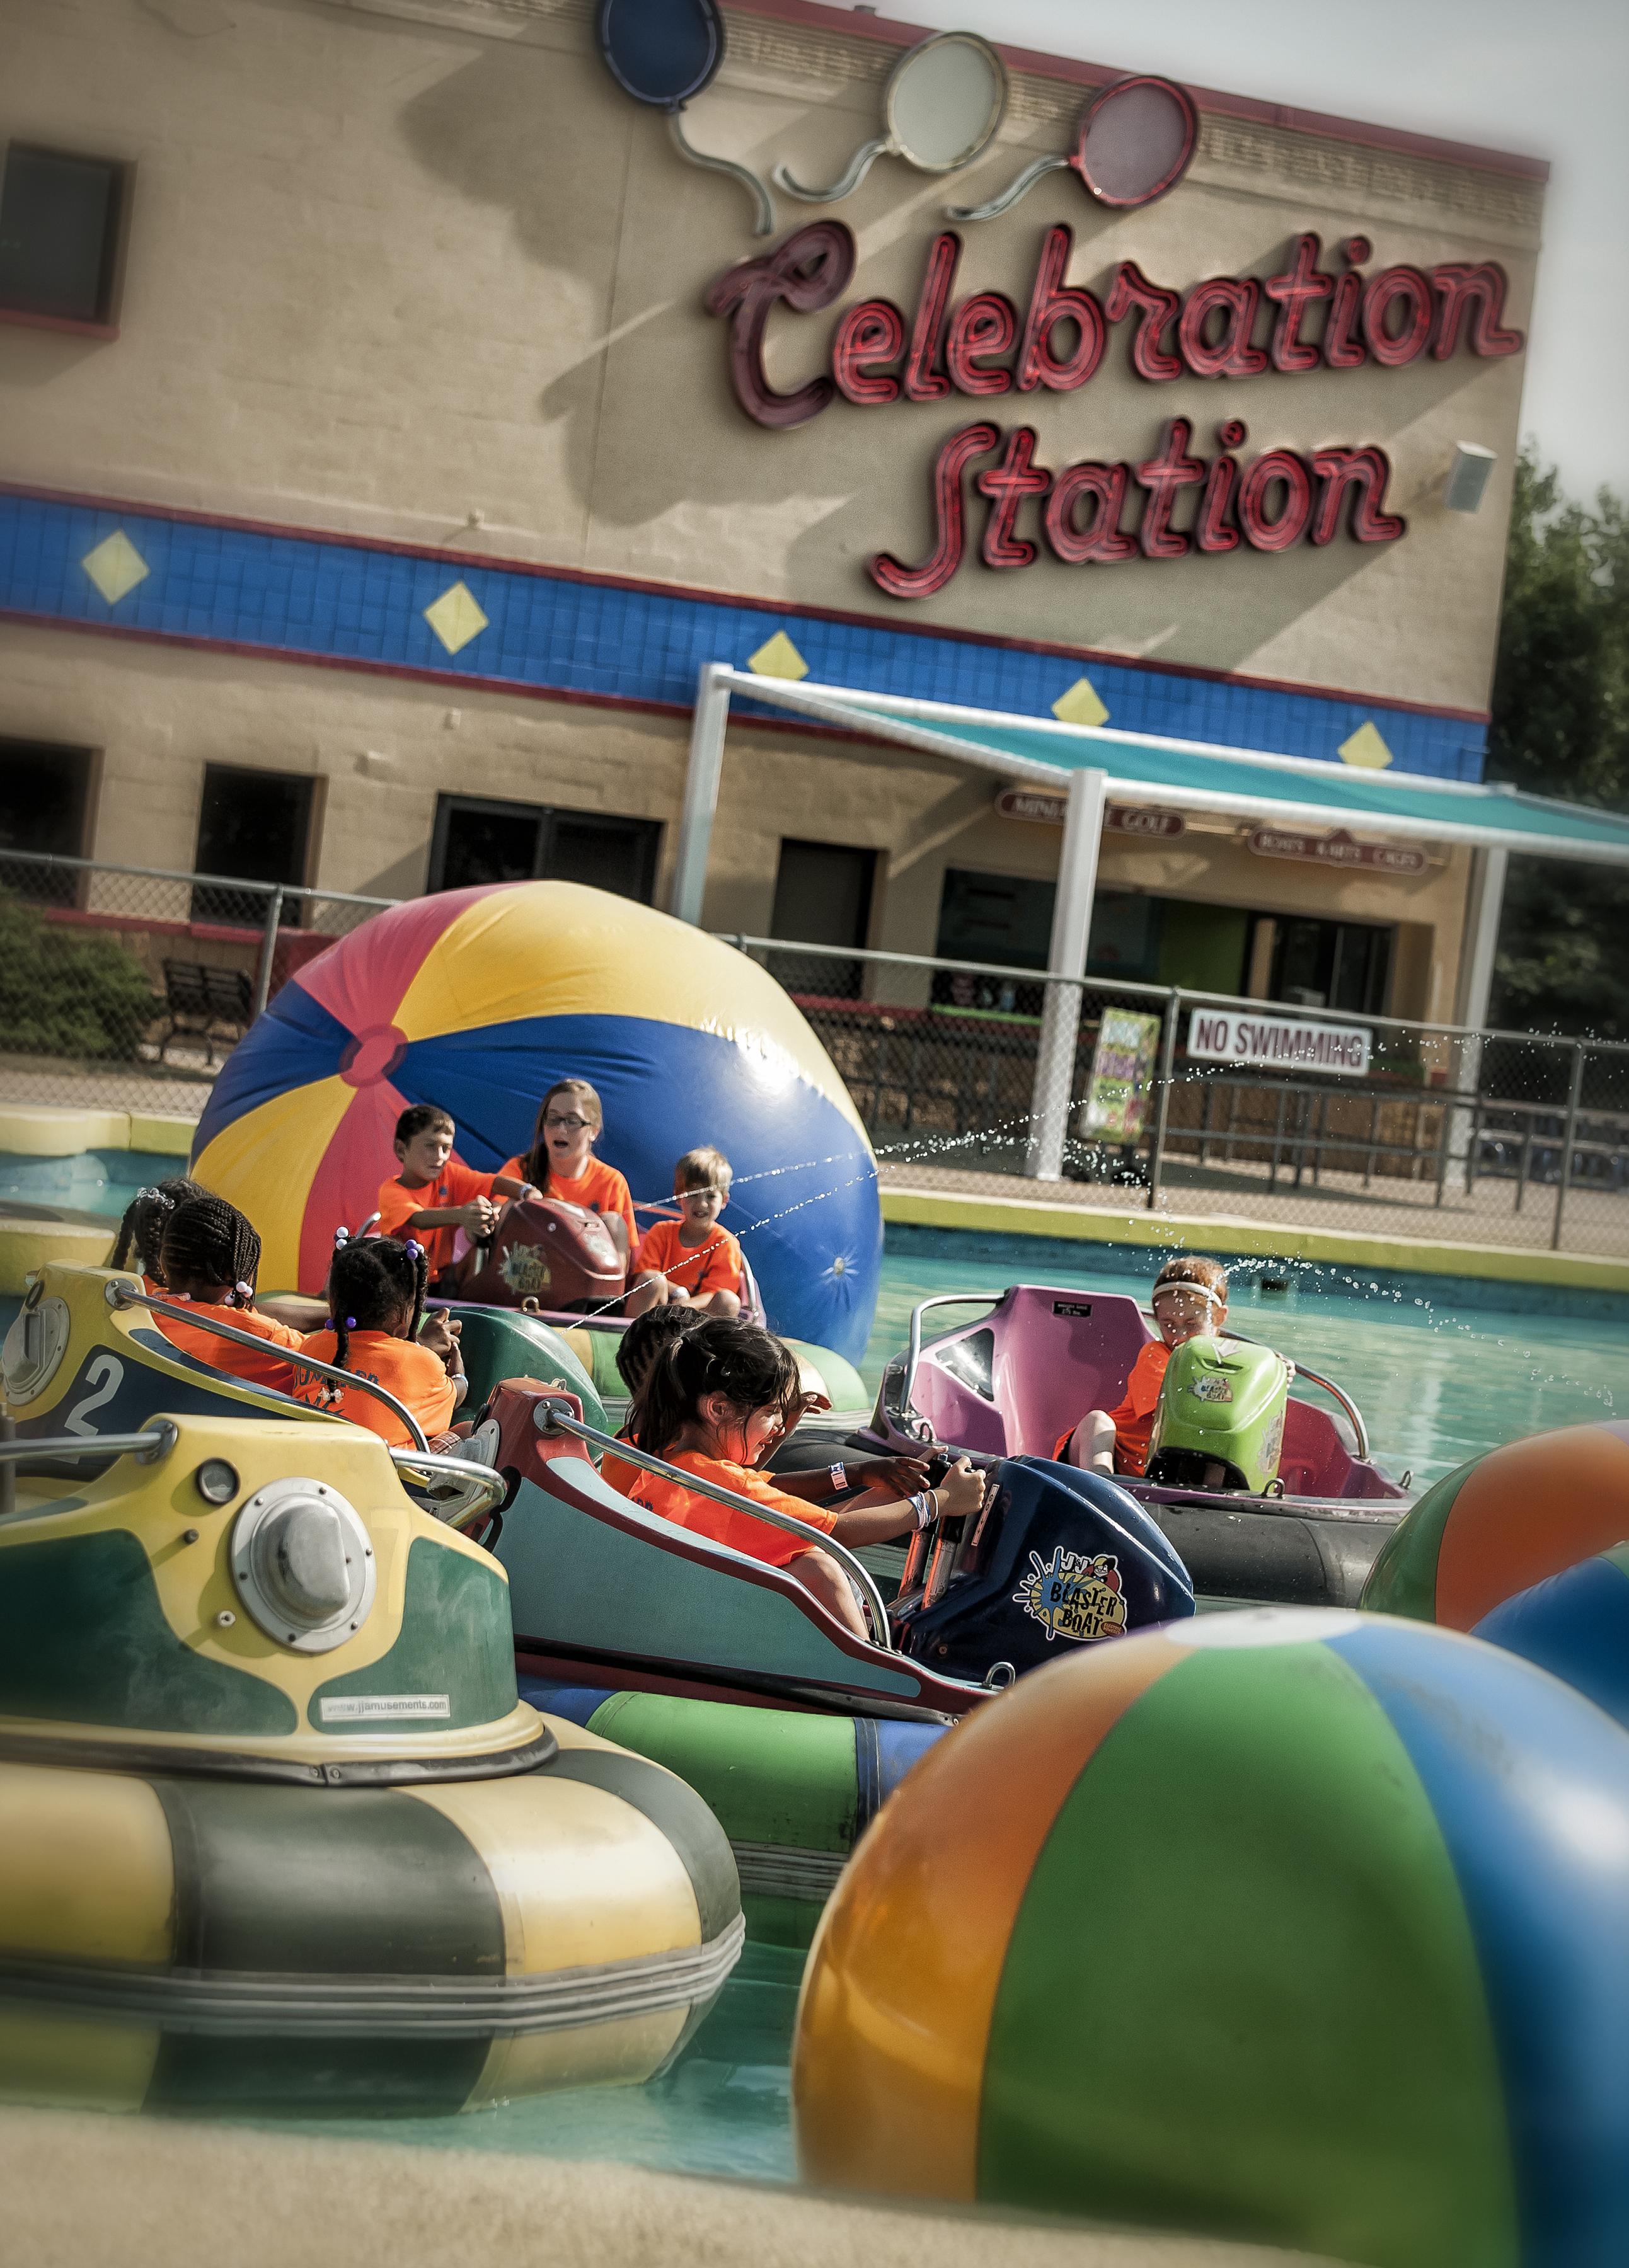 CelebrationStation.BumperBoats.Mutiple.Children.Fun_DRF0202A